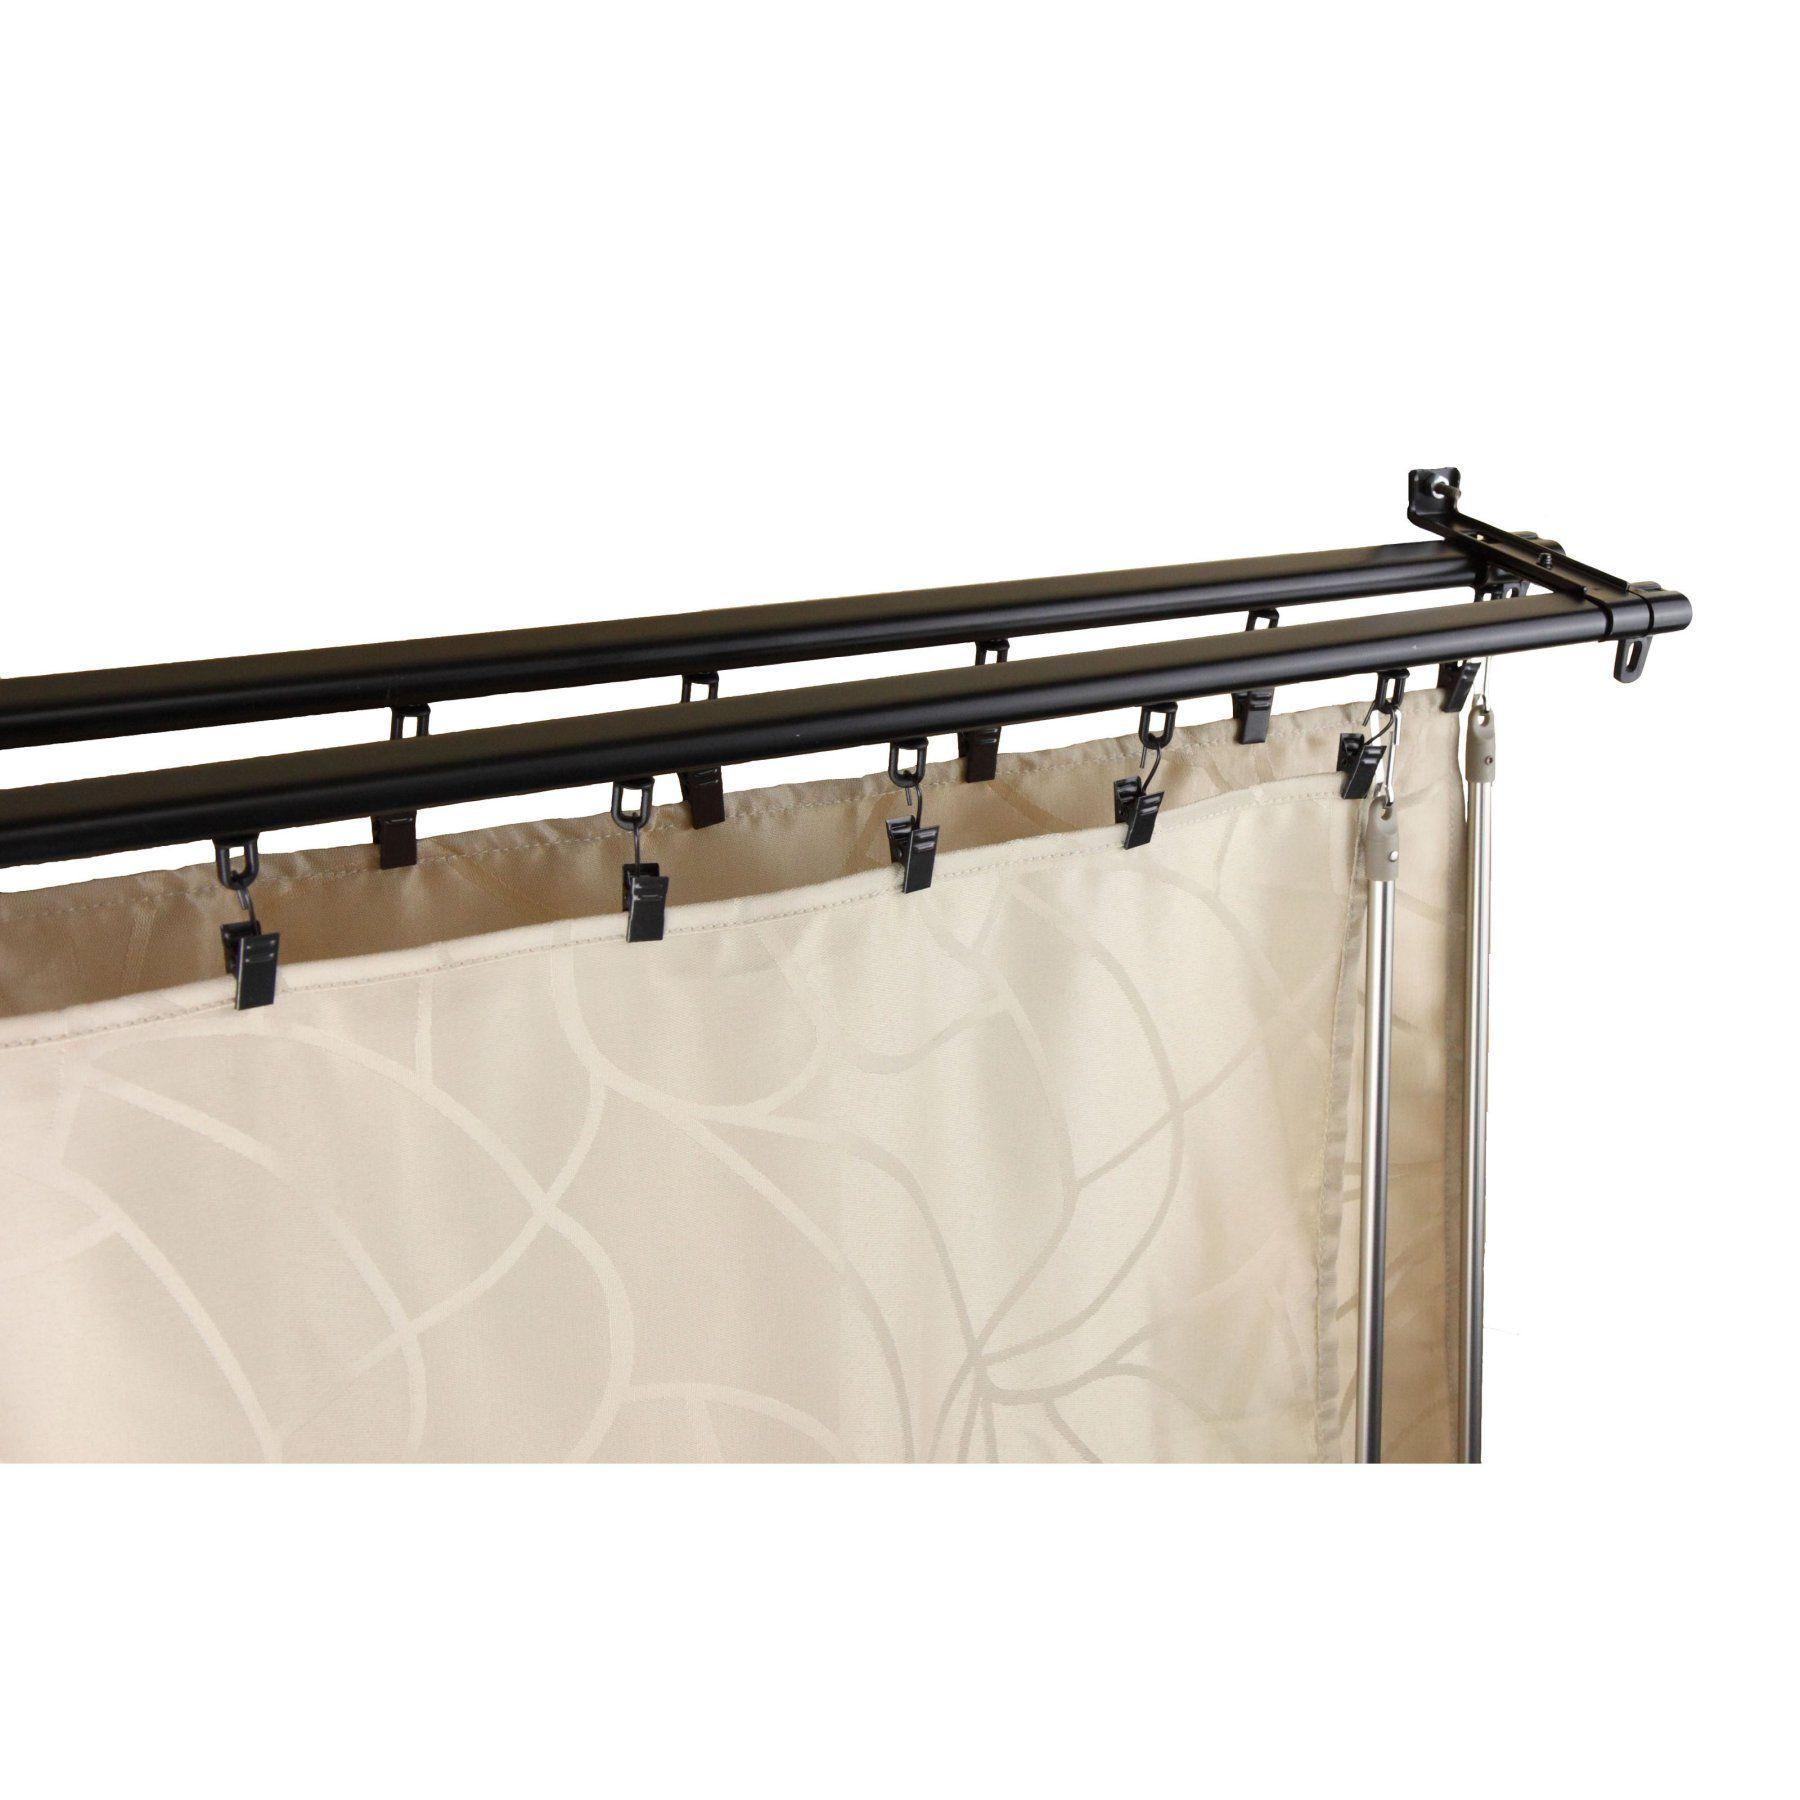 Rod desyne armor double curtain track ctd products